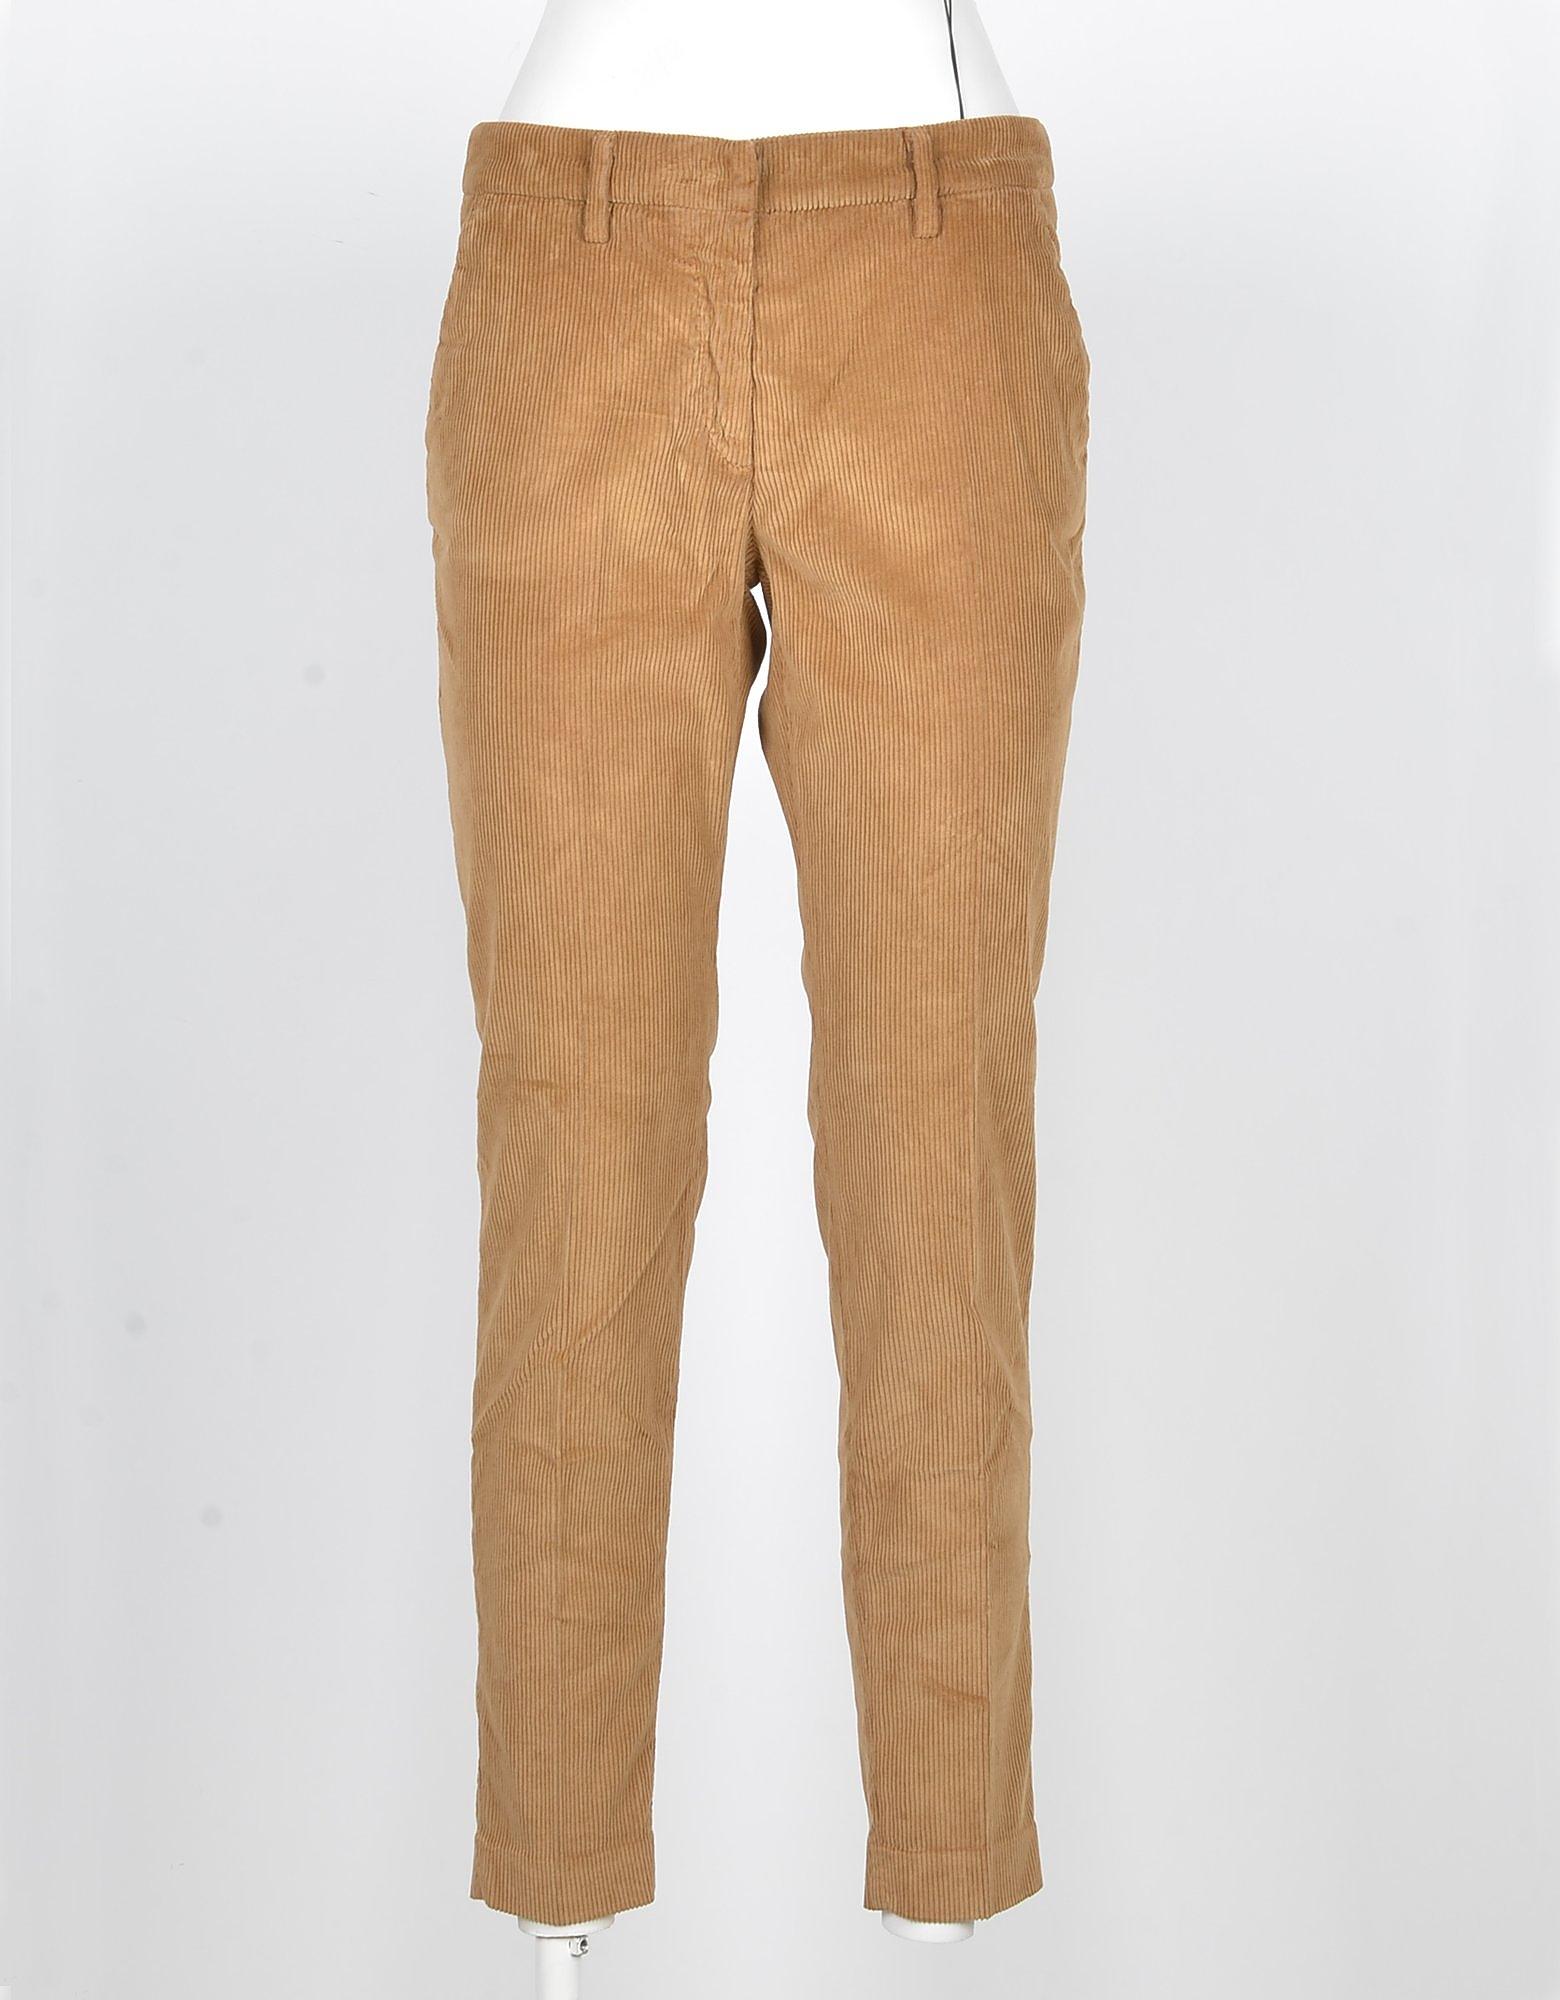 Mason's Designer Pants, Women's Beige Pants